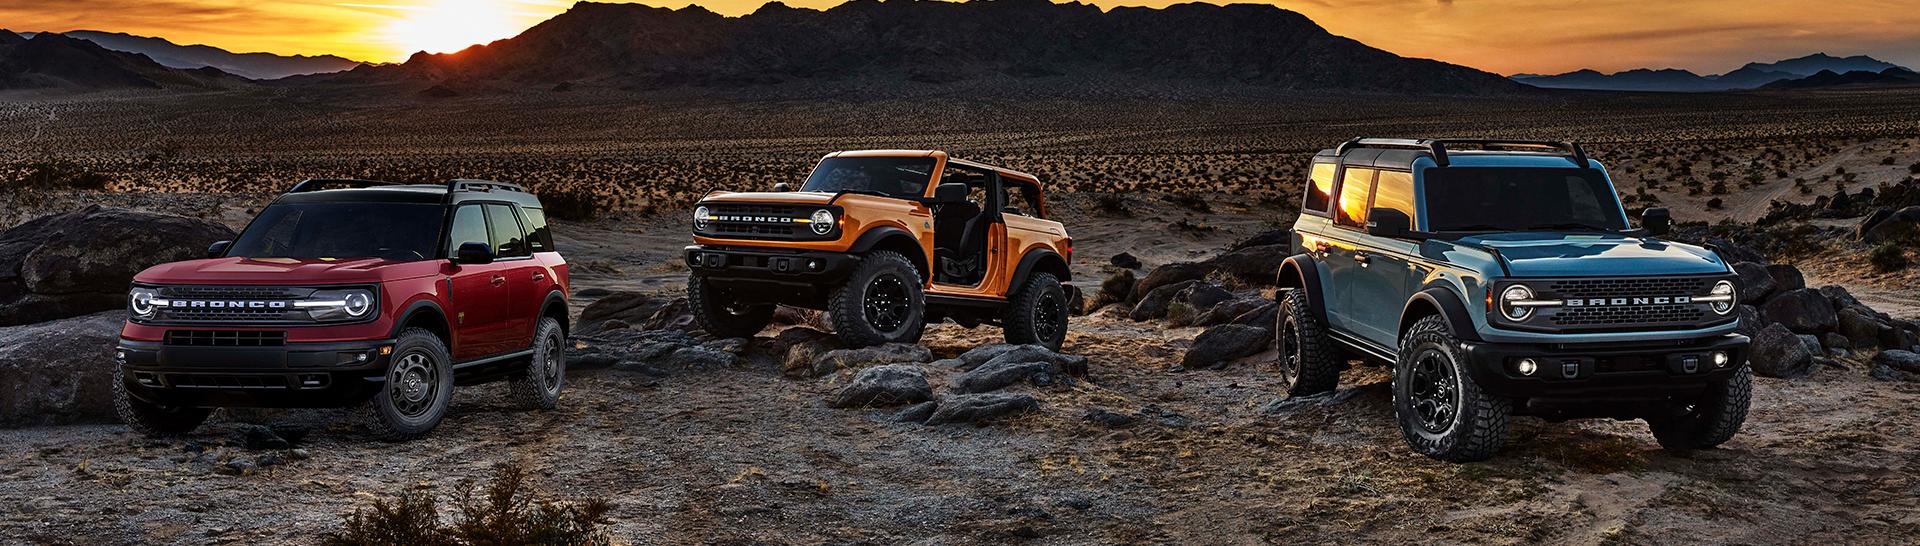 2021 Bronco Family on rocky terrain.